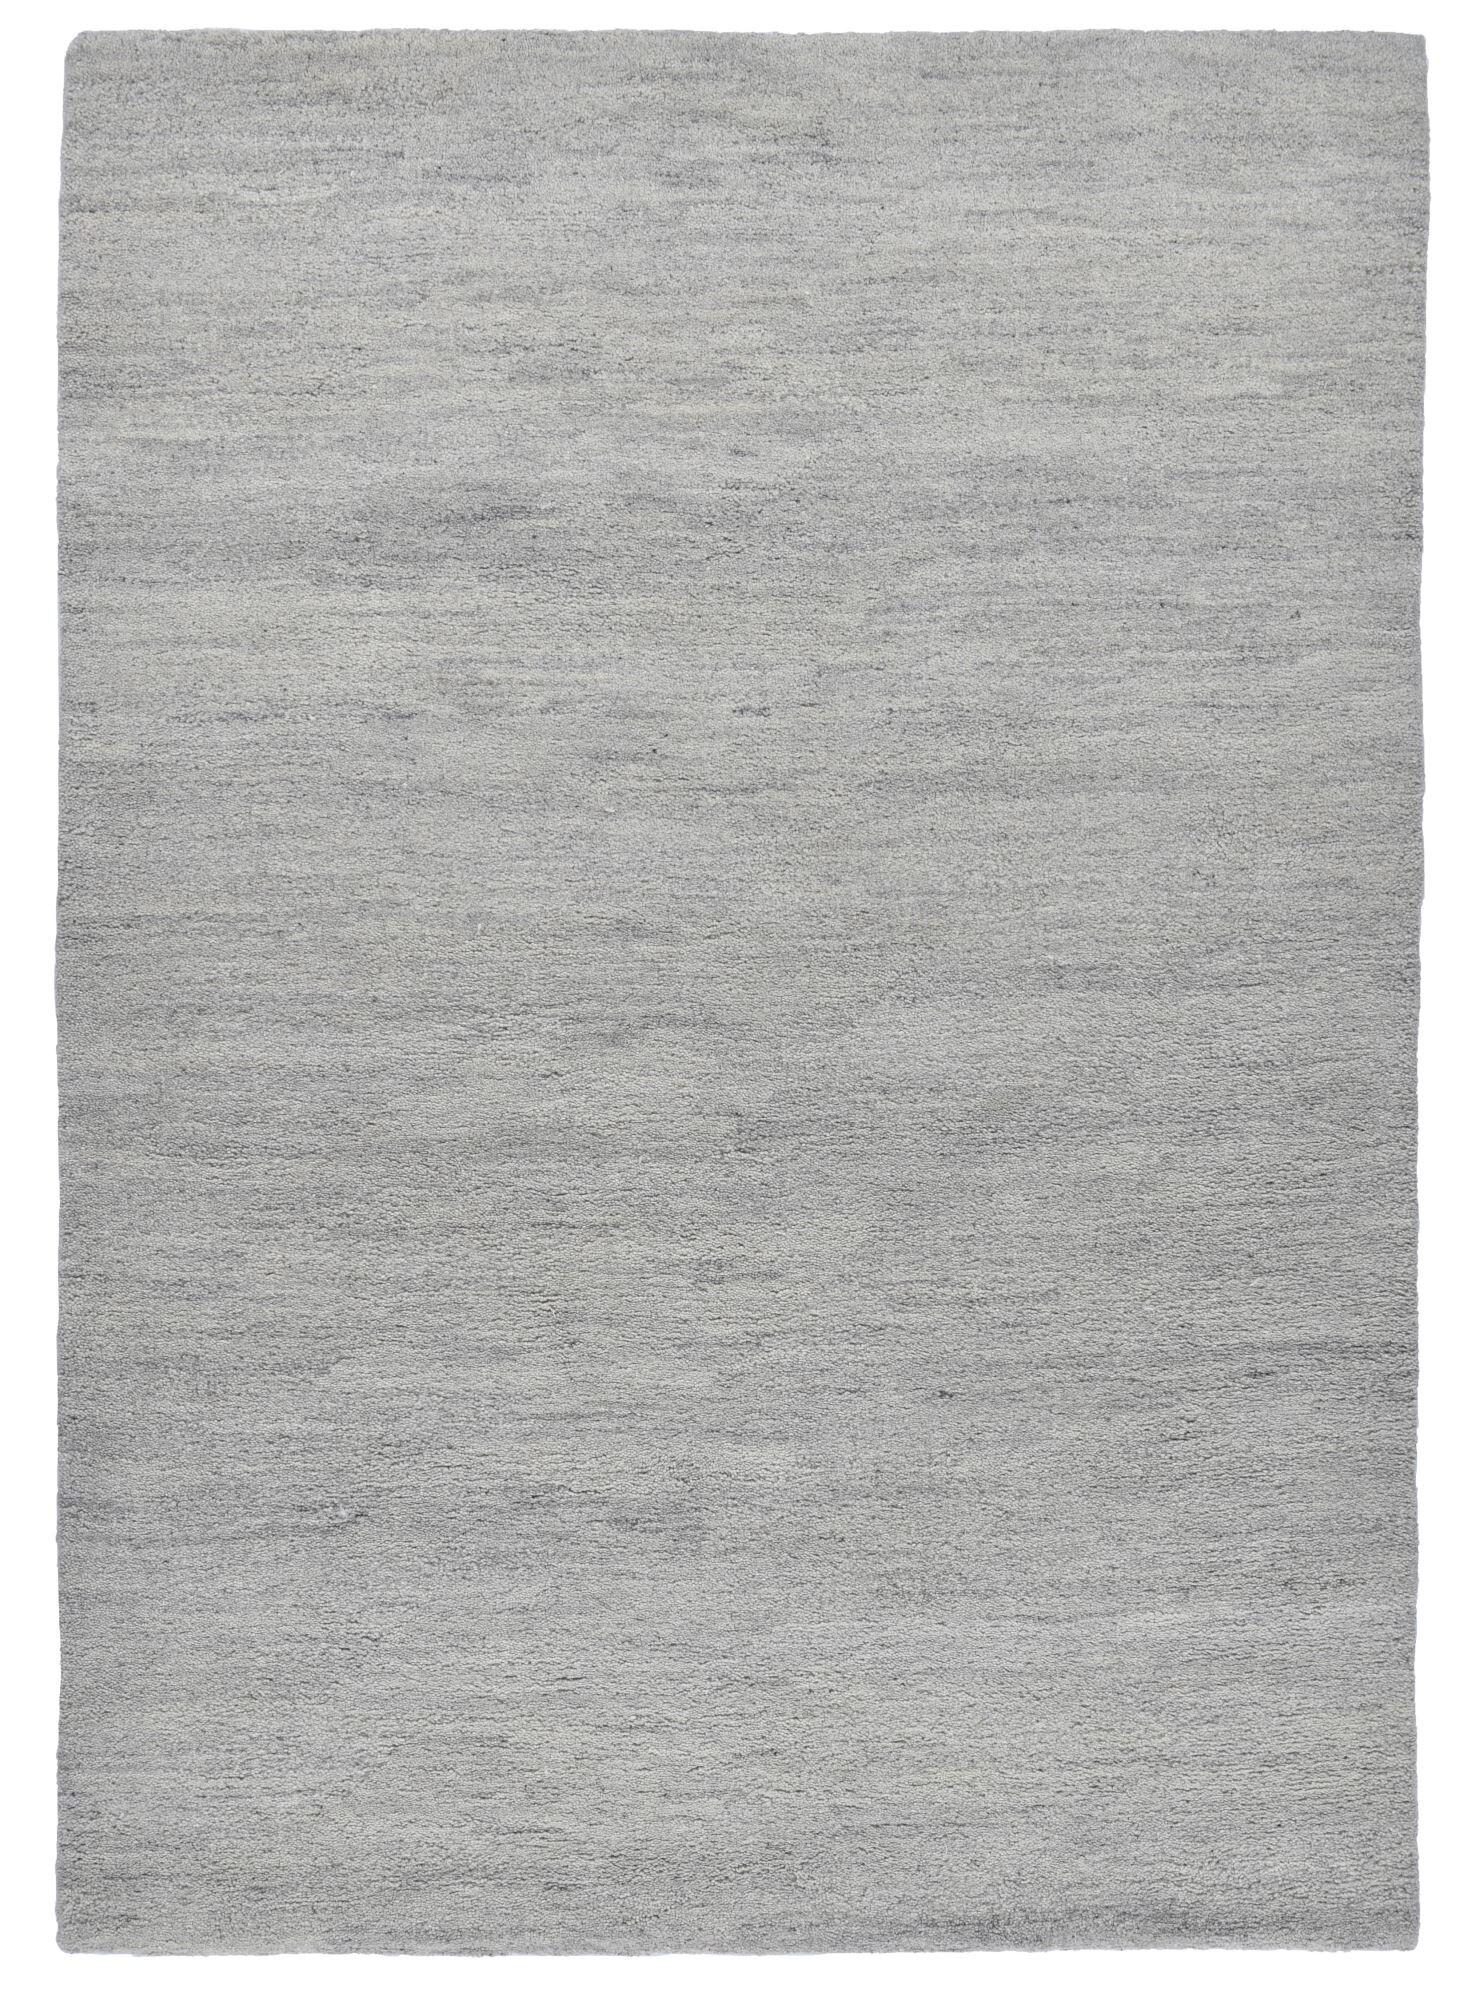 THEKO Tapis berber du maroc en laine naturelle gris 70x140